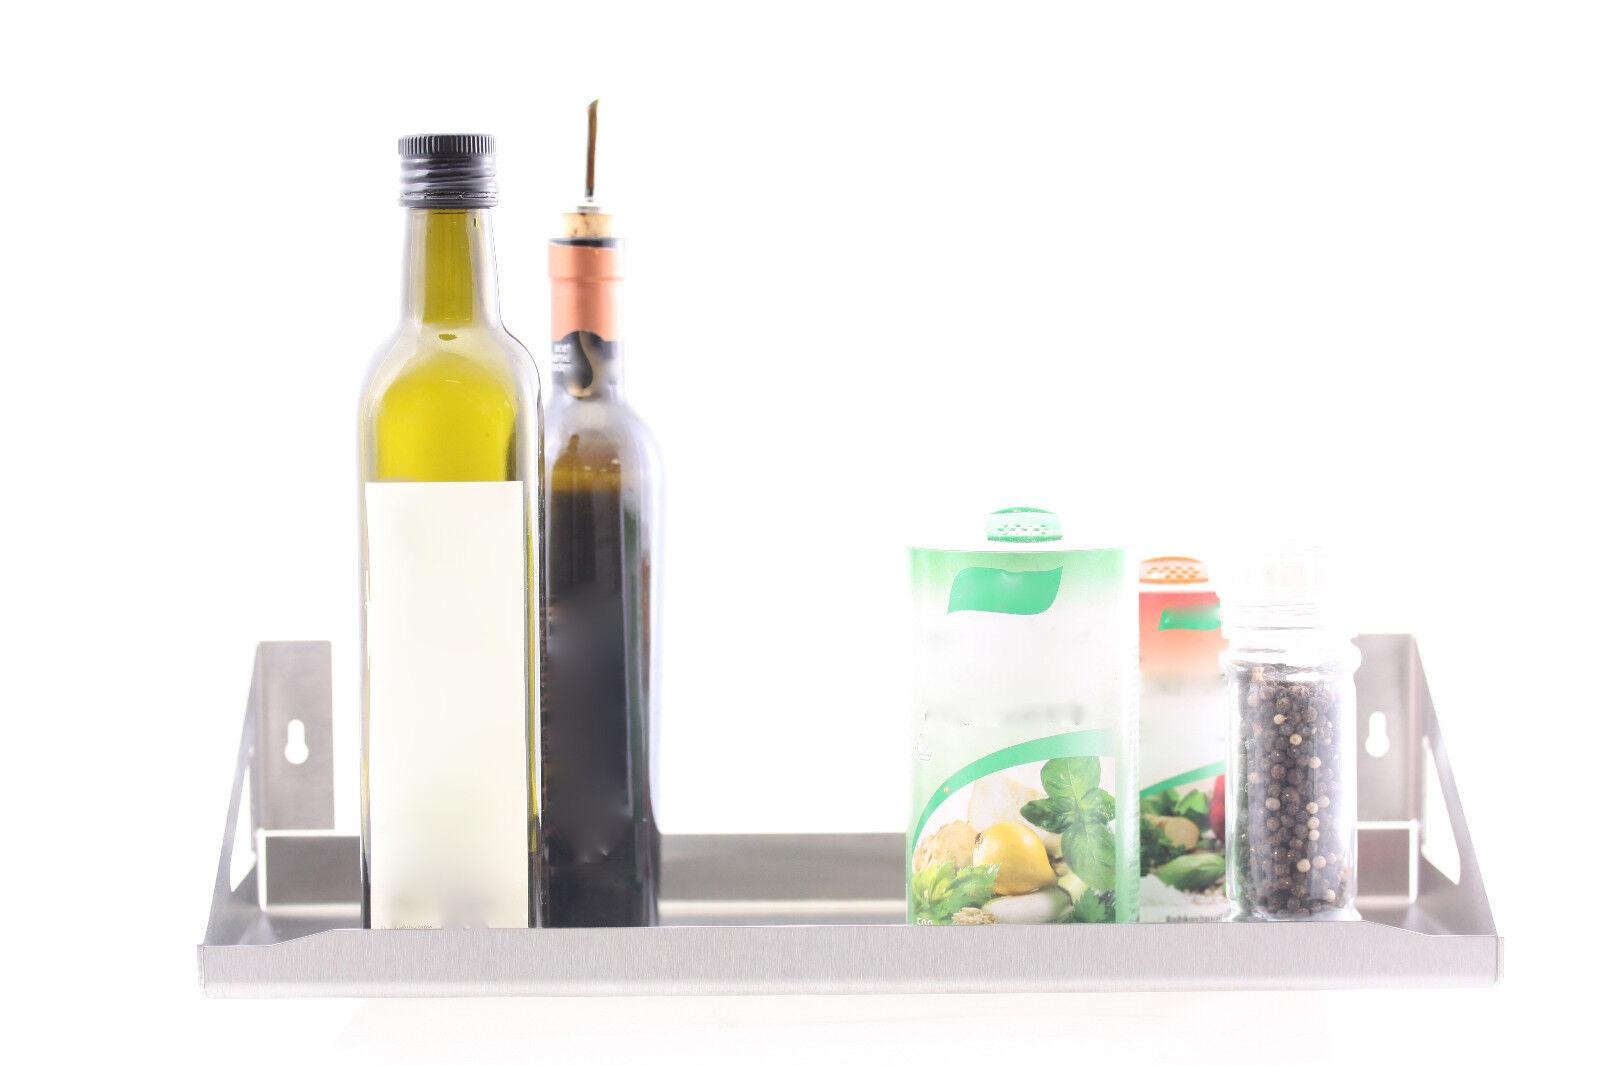 Gewürzregal Regal Wandboard Küche Edelstahl Vari für zB Gewürze 2 Stück